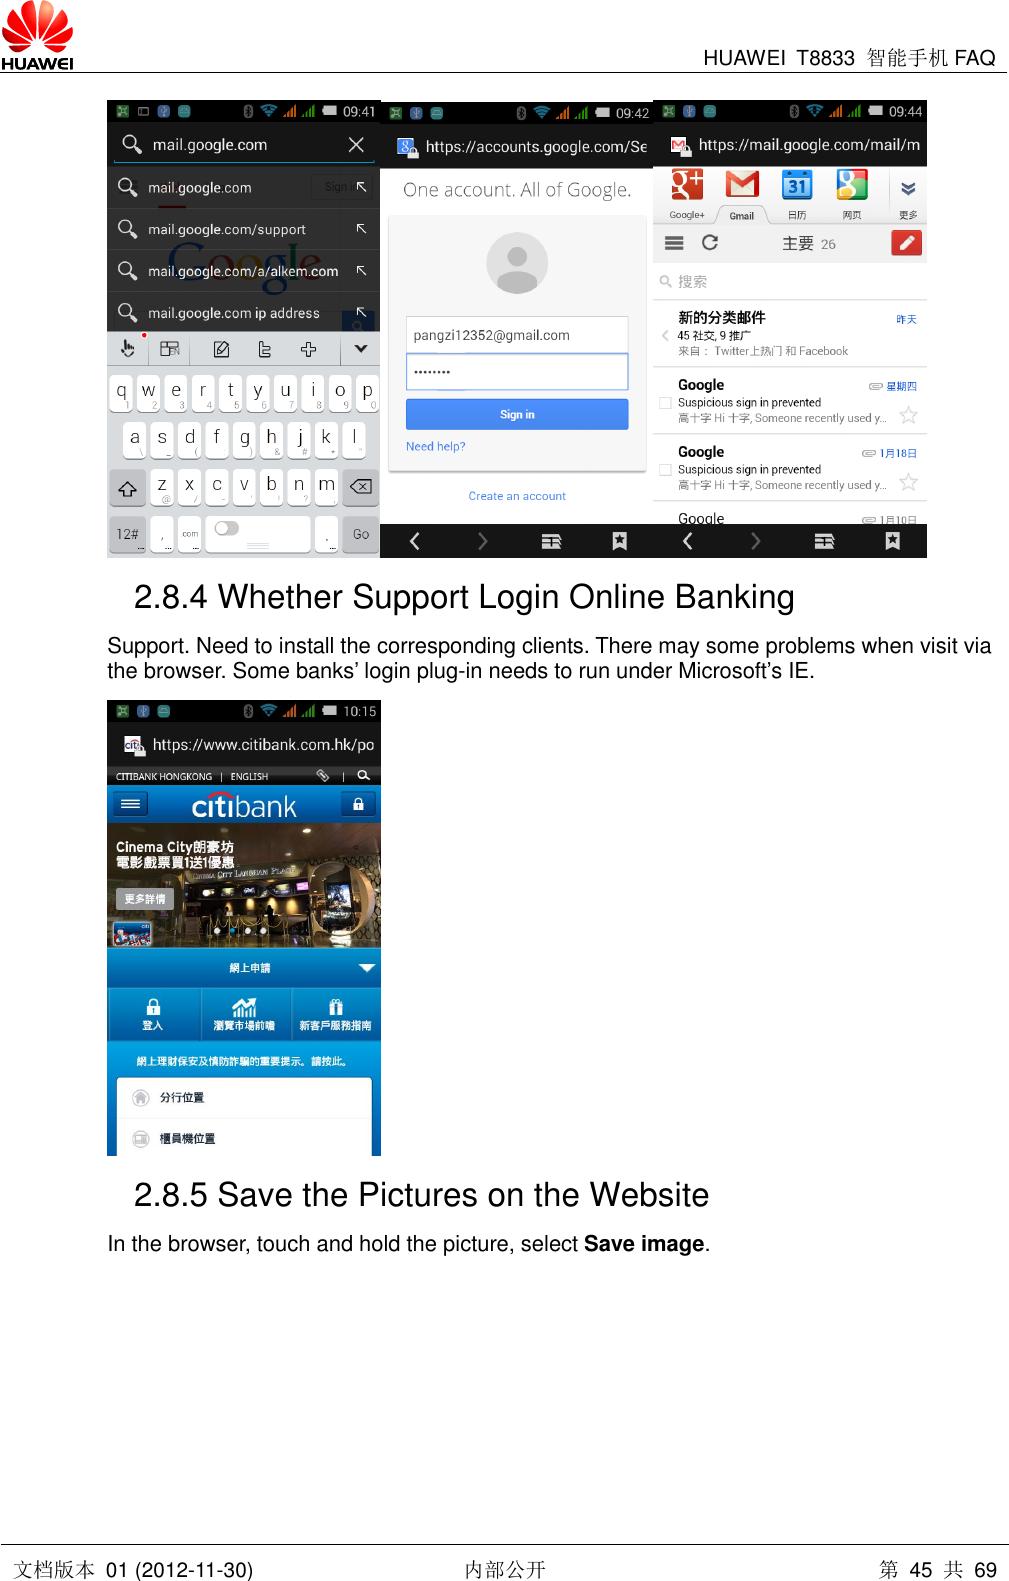 Huawei y3 lite smart mobile phone faq 20151128 page 45 of 69 huawei y3 lite smart mobile phone faq 20151128 sciox Gallery